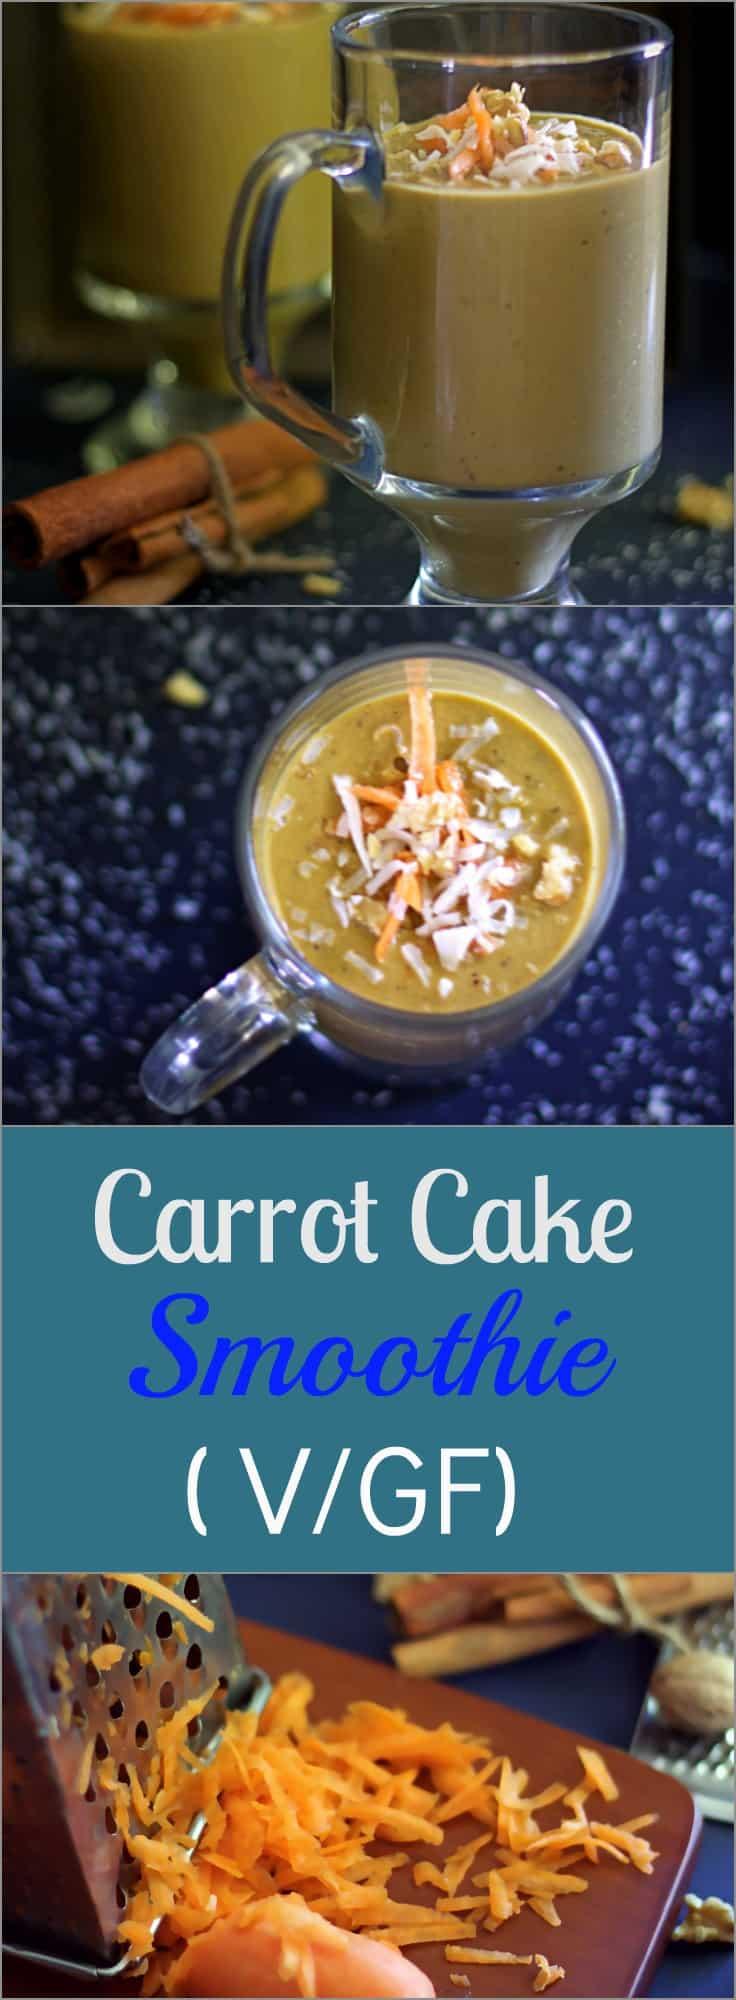 healthy-vegan-glutenfree-carrot-cake-smoothie a healthy delicious gluten free smoothie tasting just like carrot cake